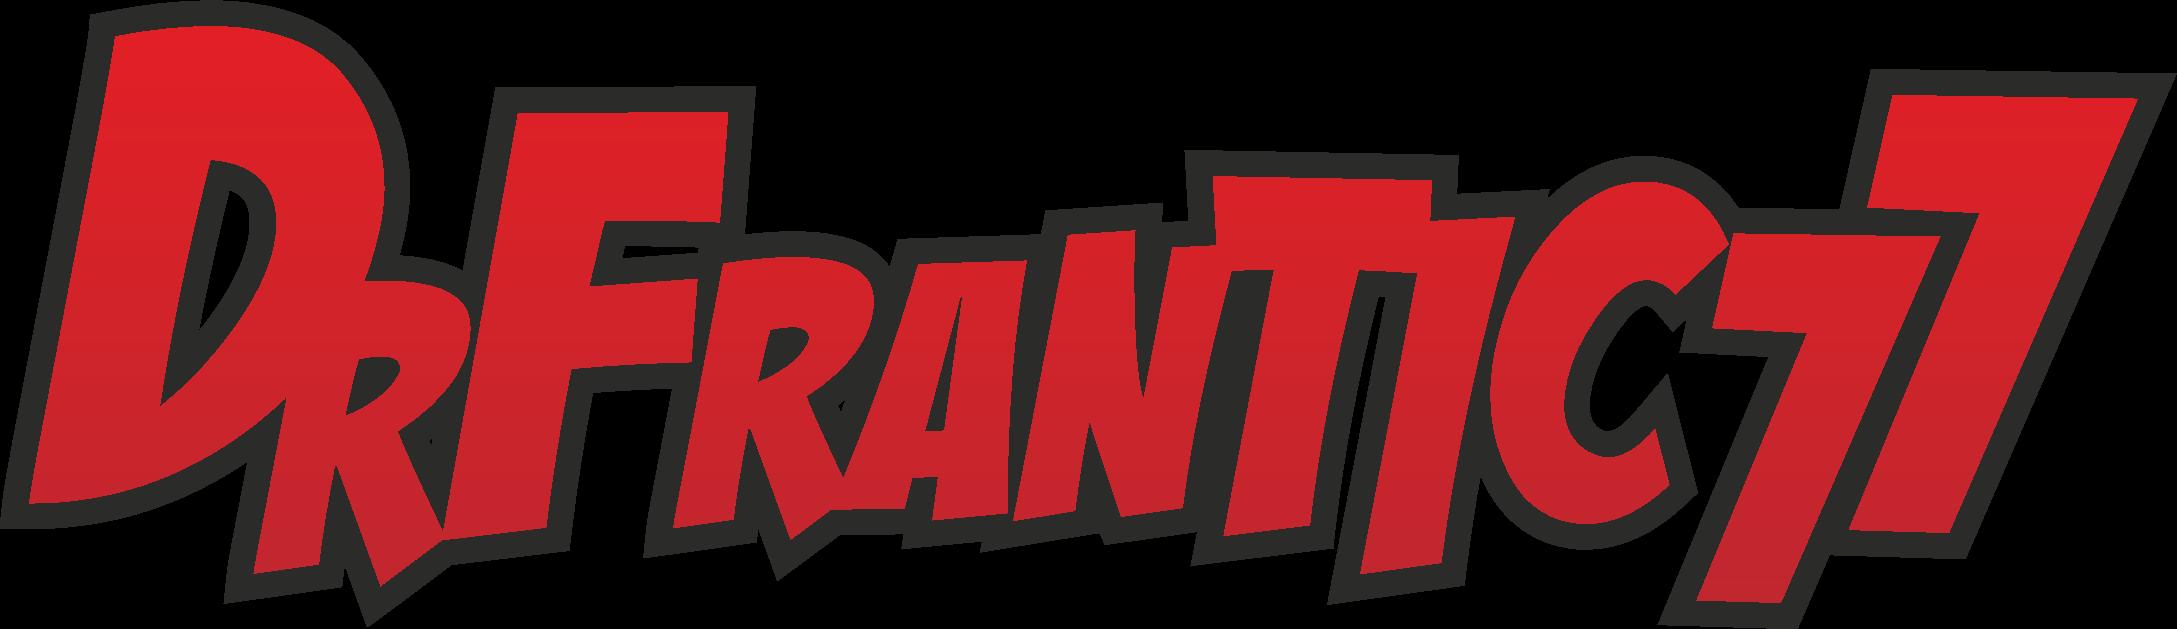 DrFrantic77 Blog rund um FPV